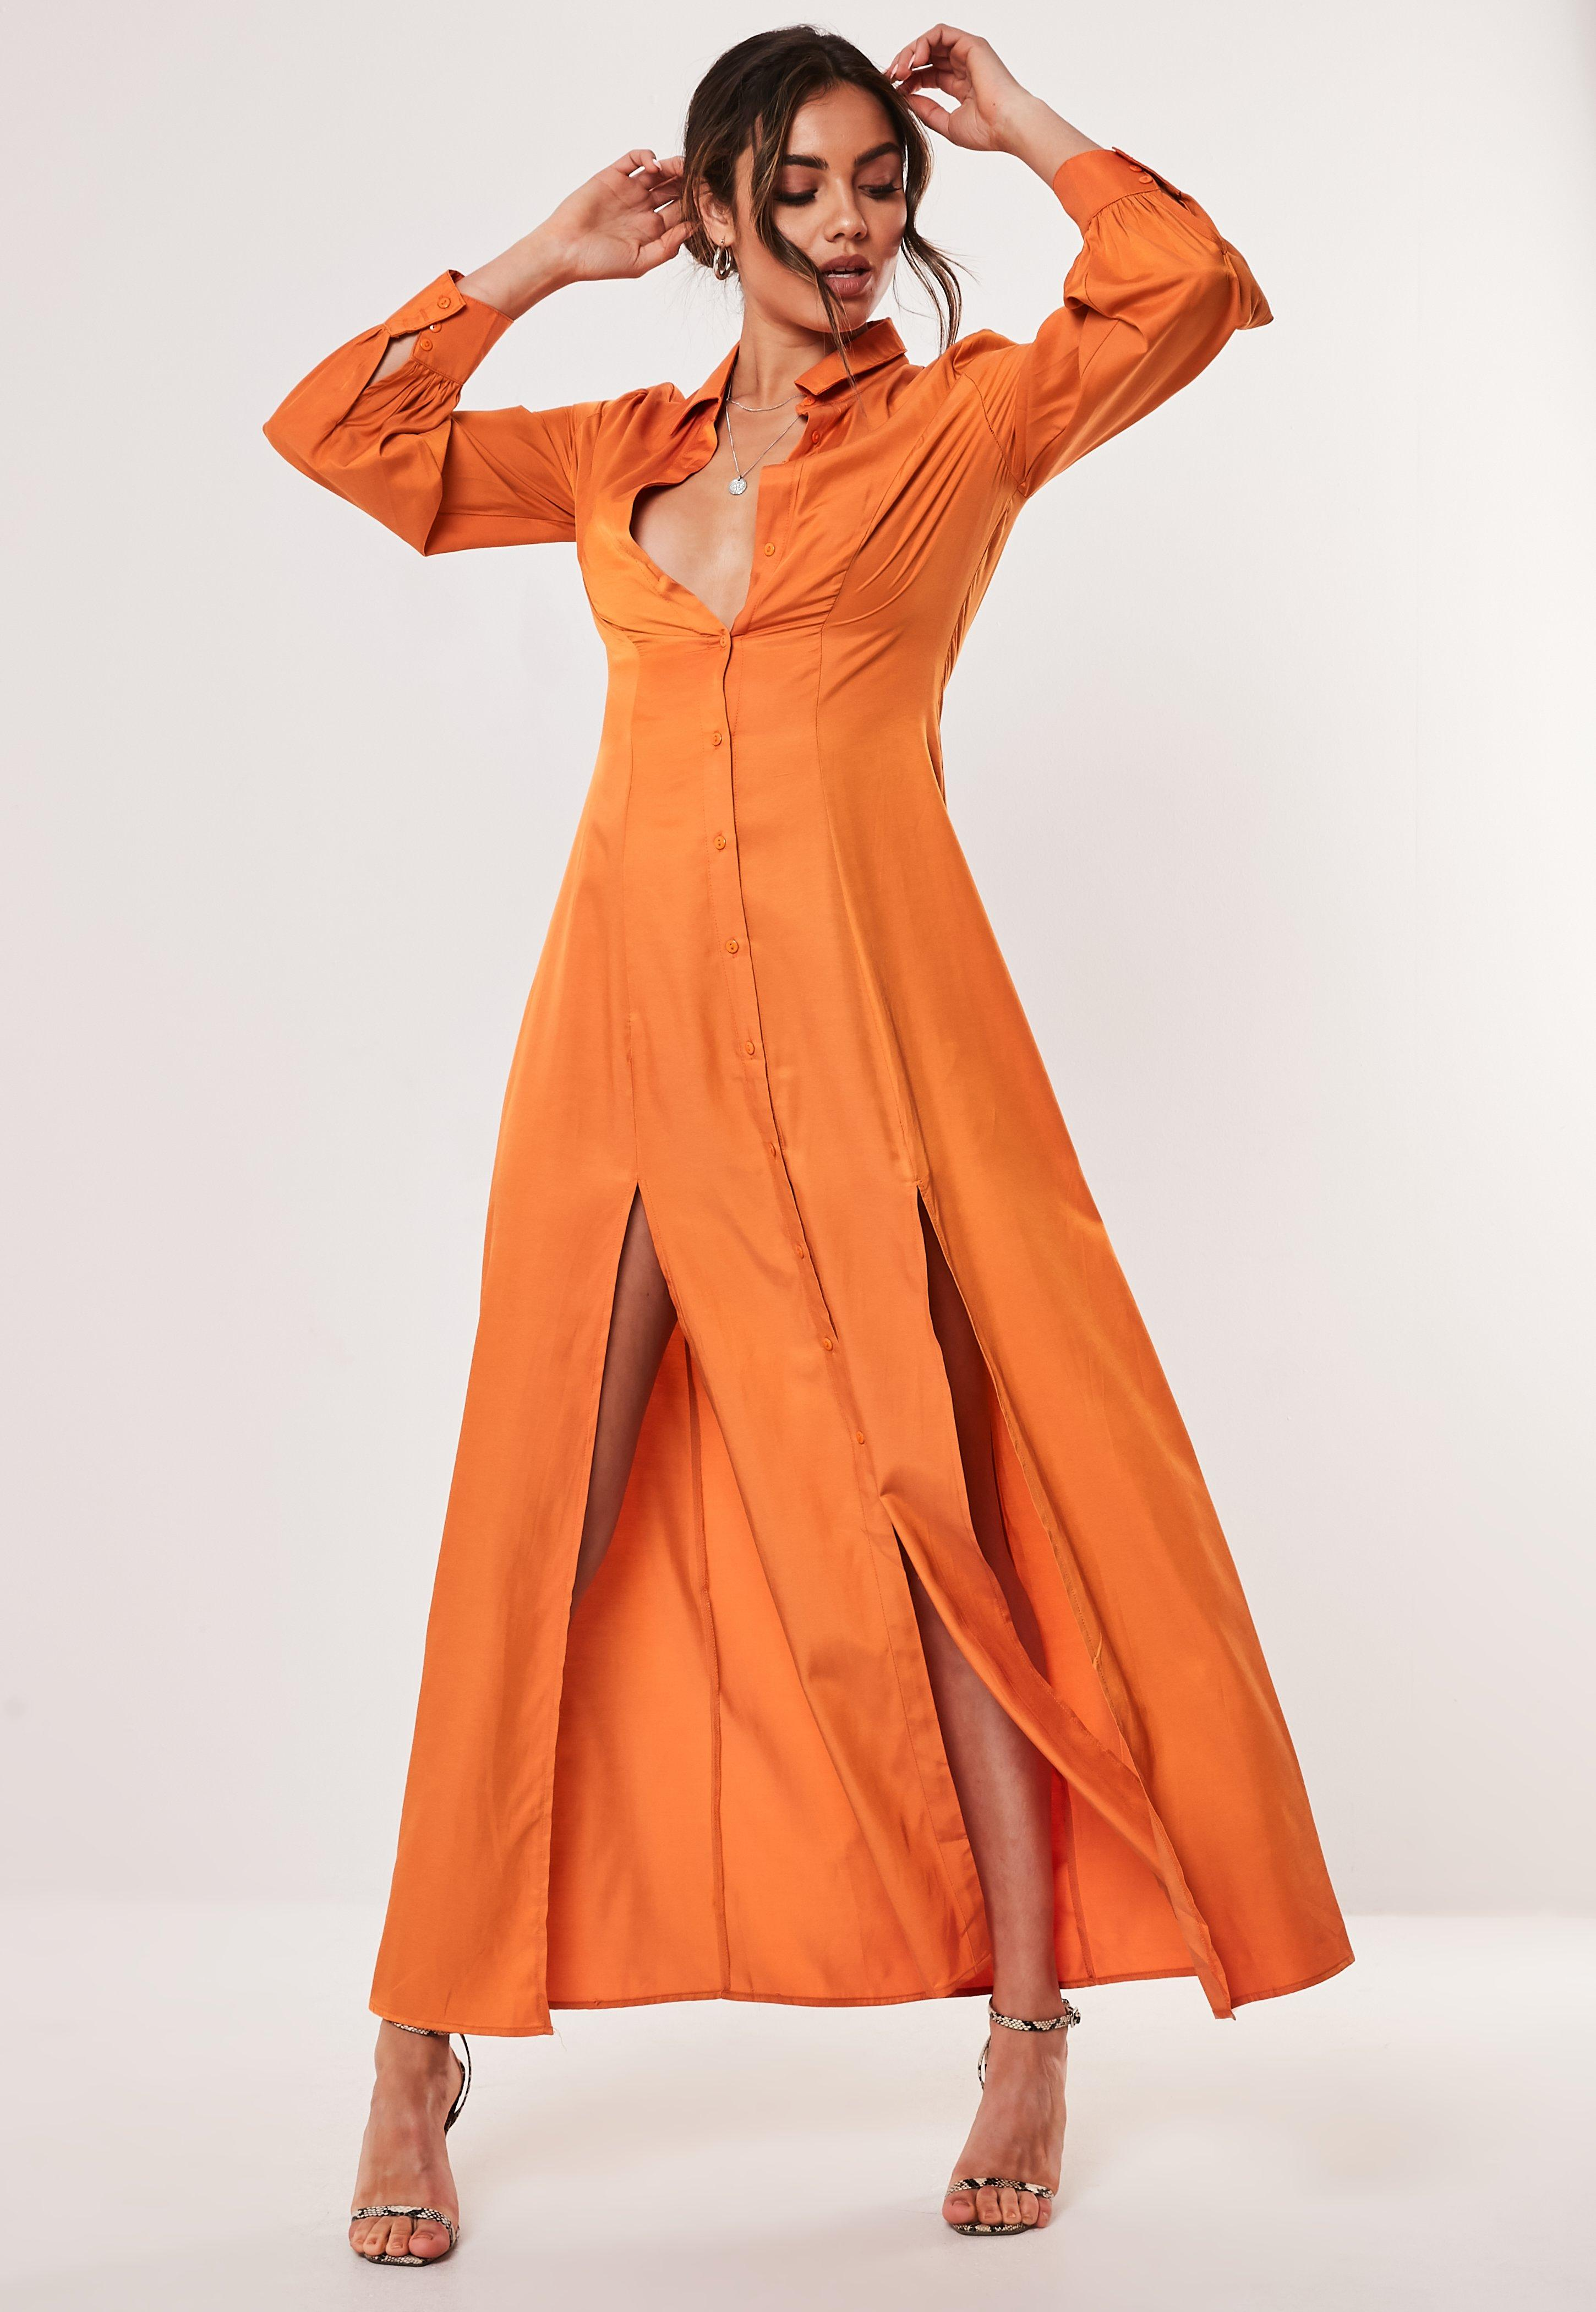 437fc62ca76 Maxi Dresses | Long & Flowy Dresses - Missguided